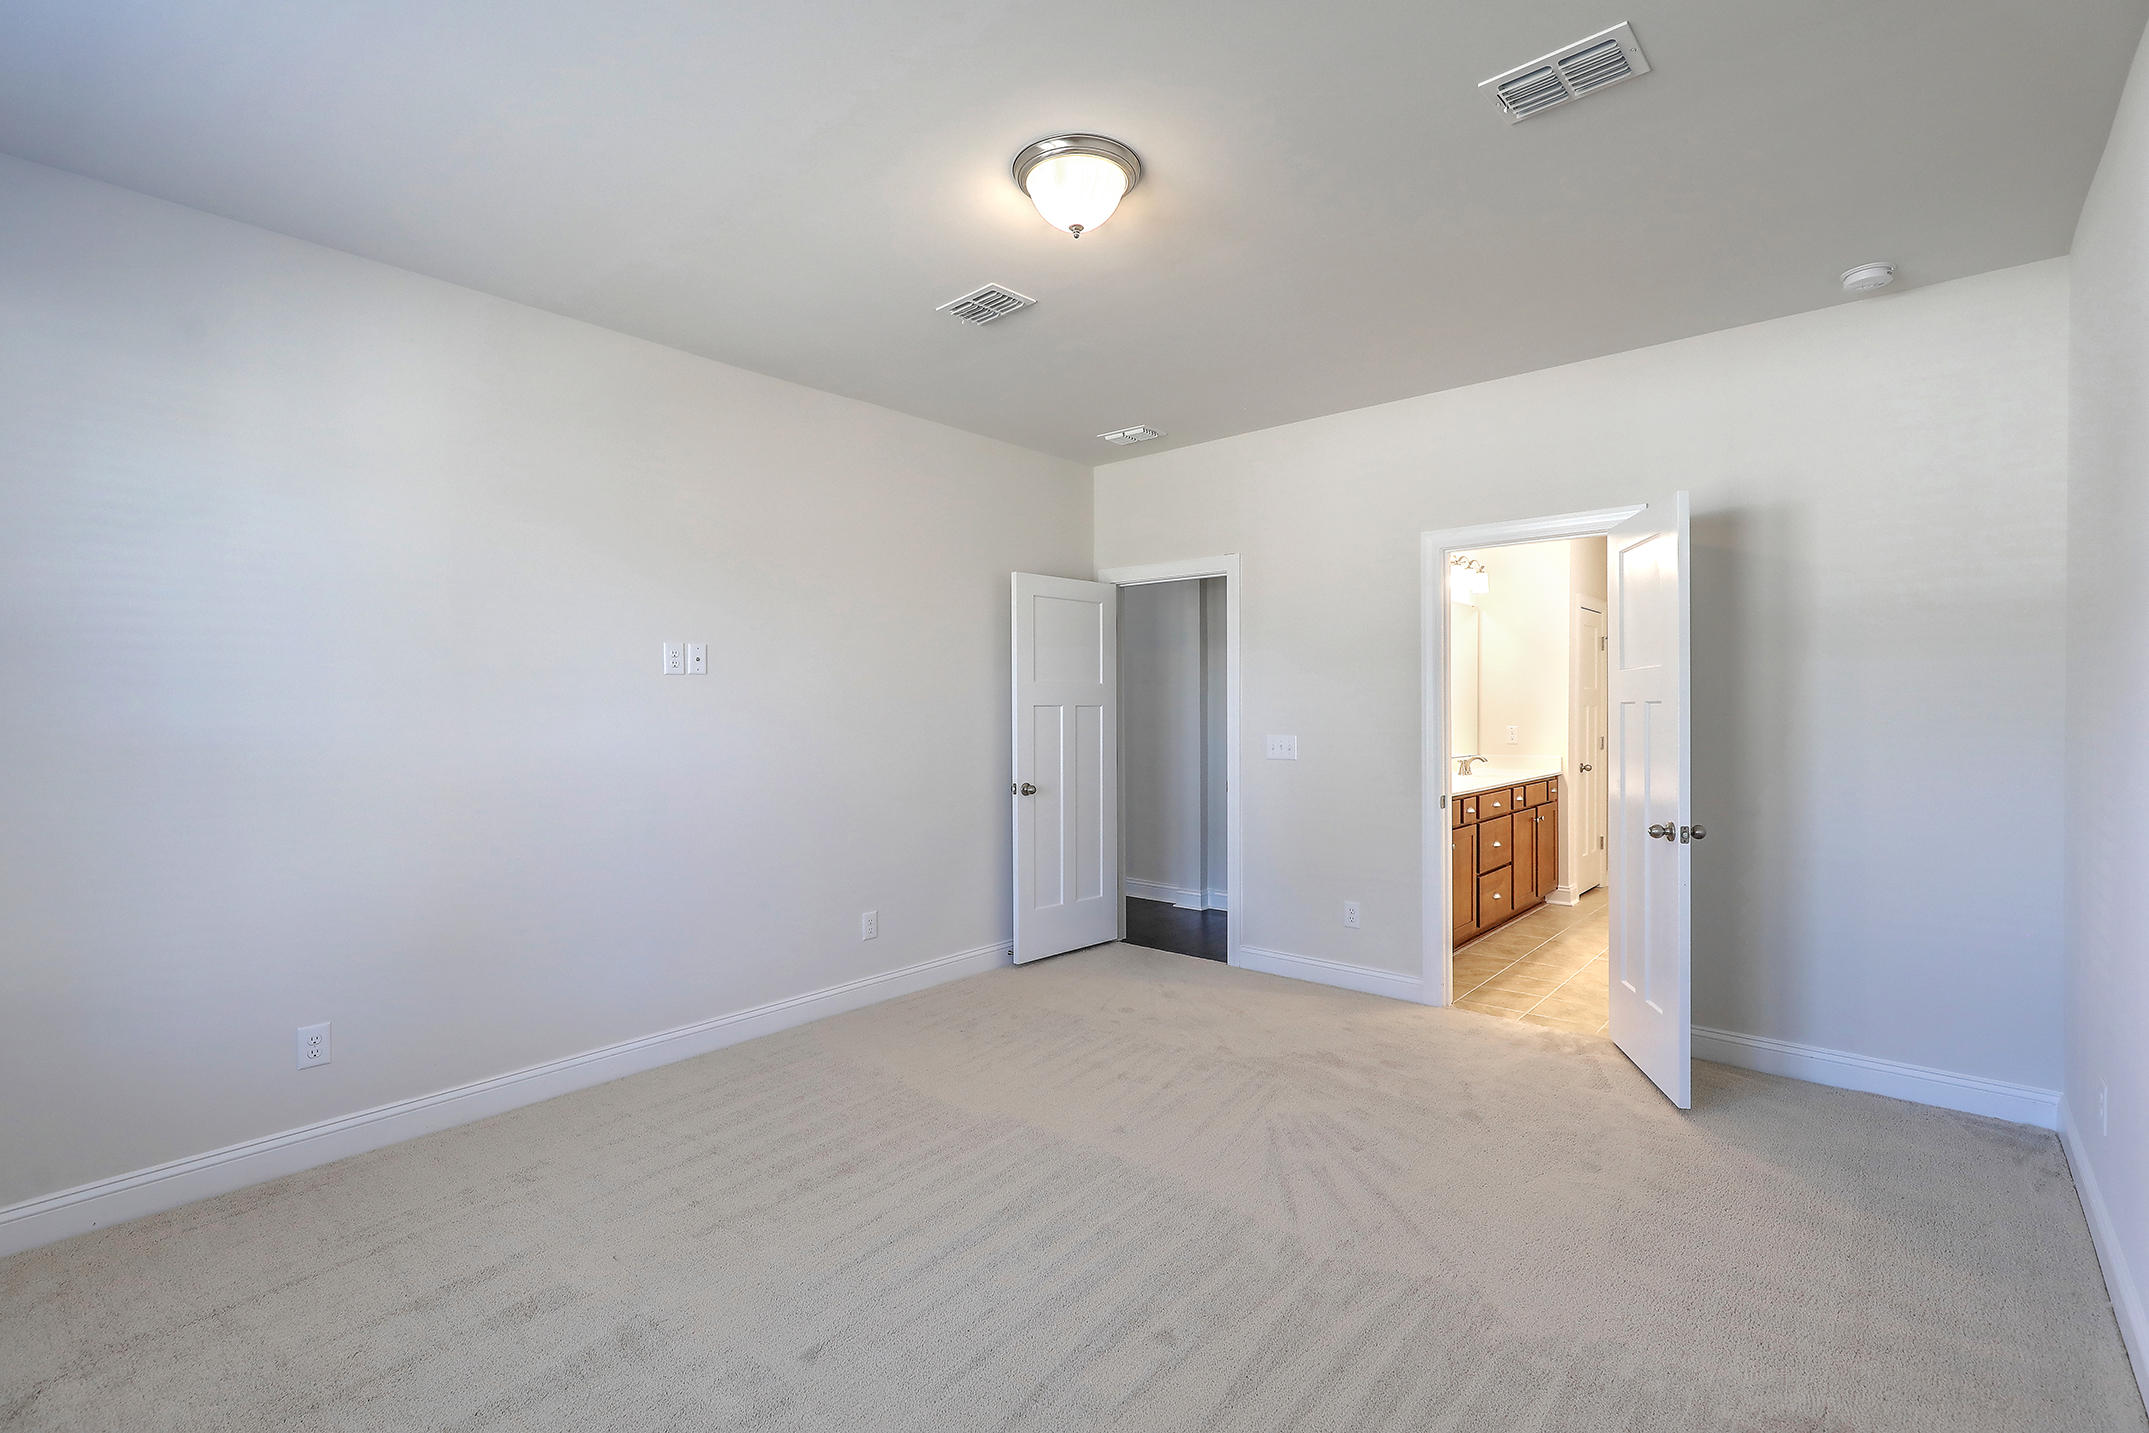 Bentley Park Homes For Sale - 1281 Gannett, Mount Pleasant, SC - 6